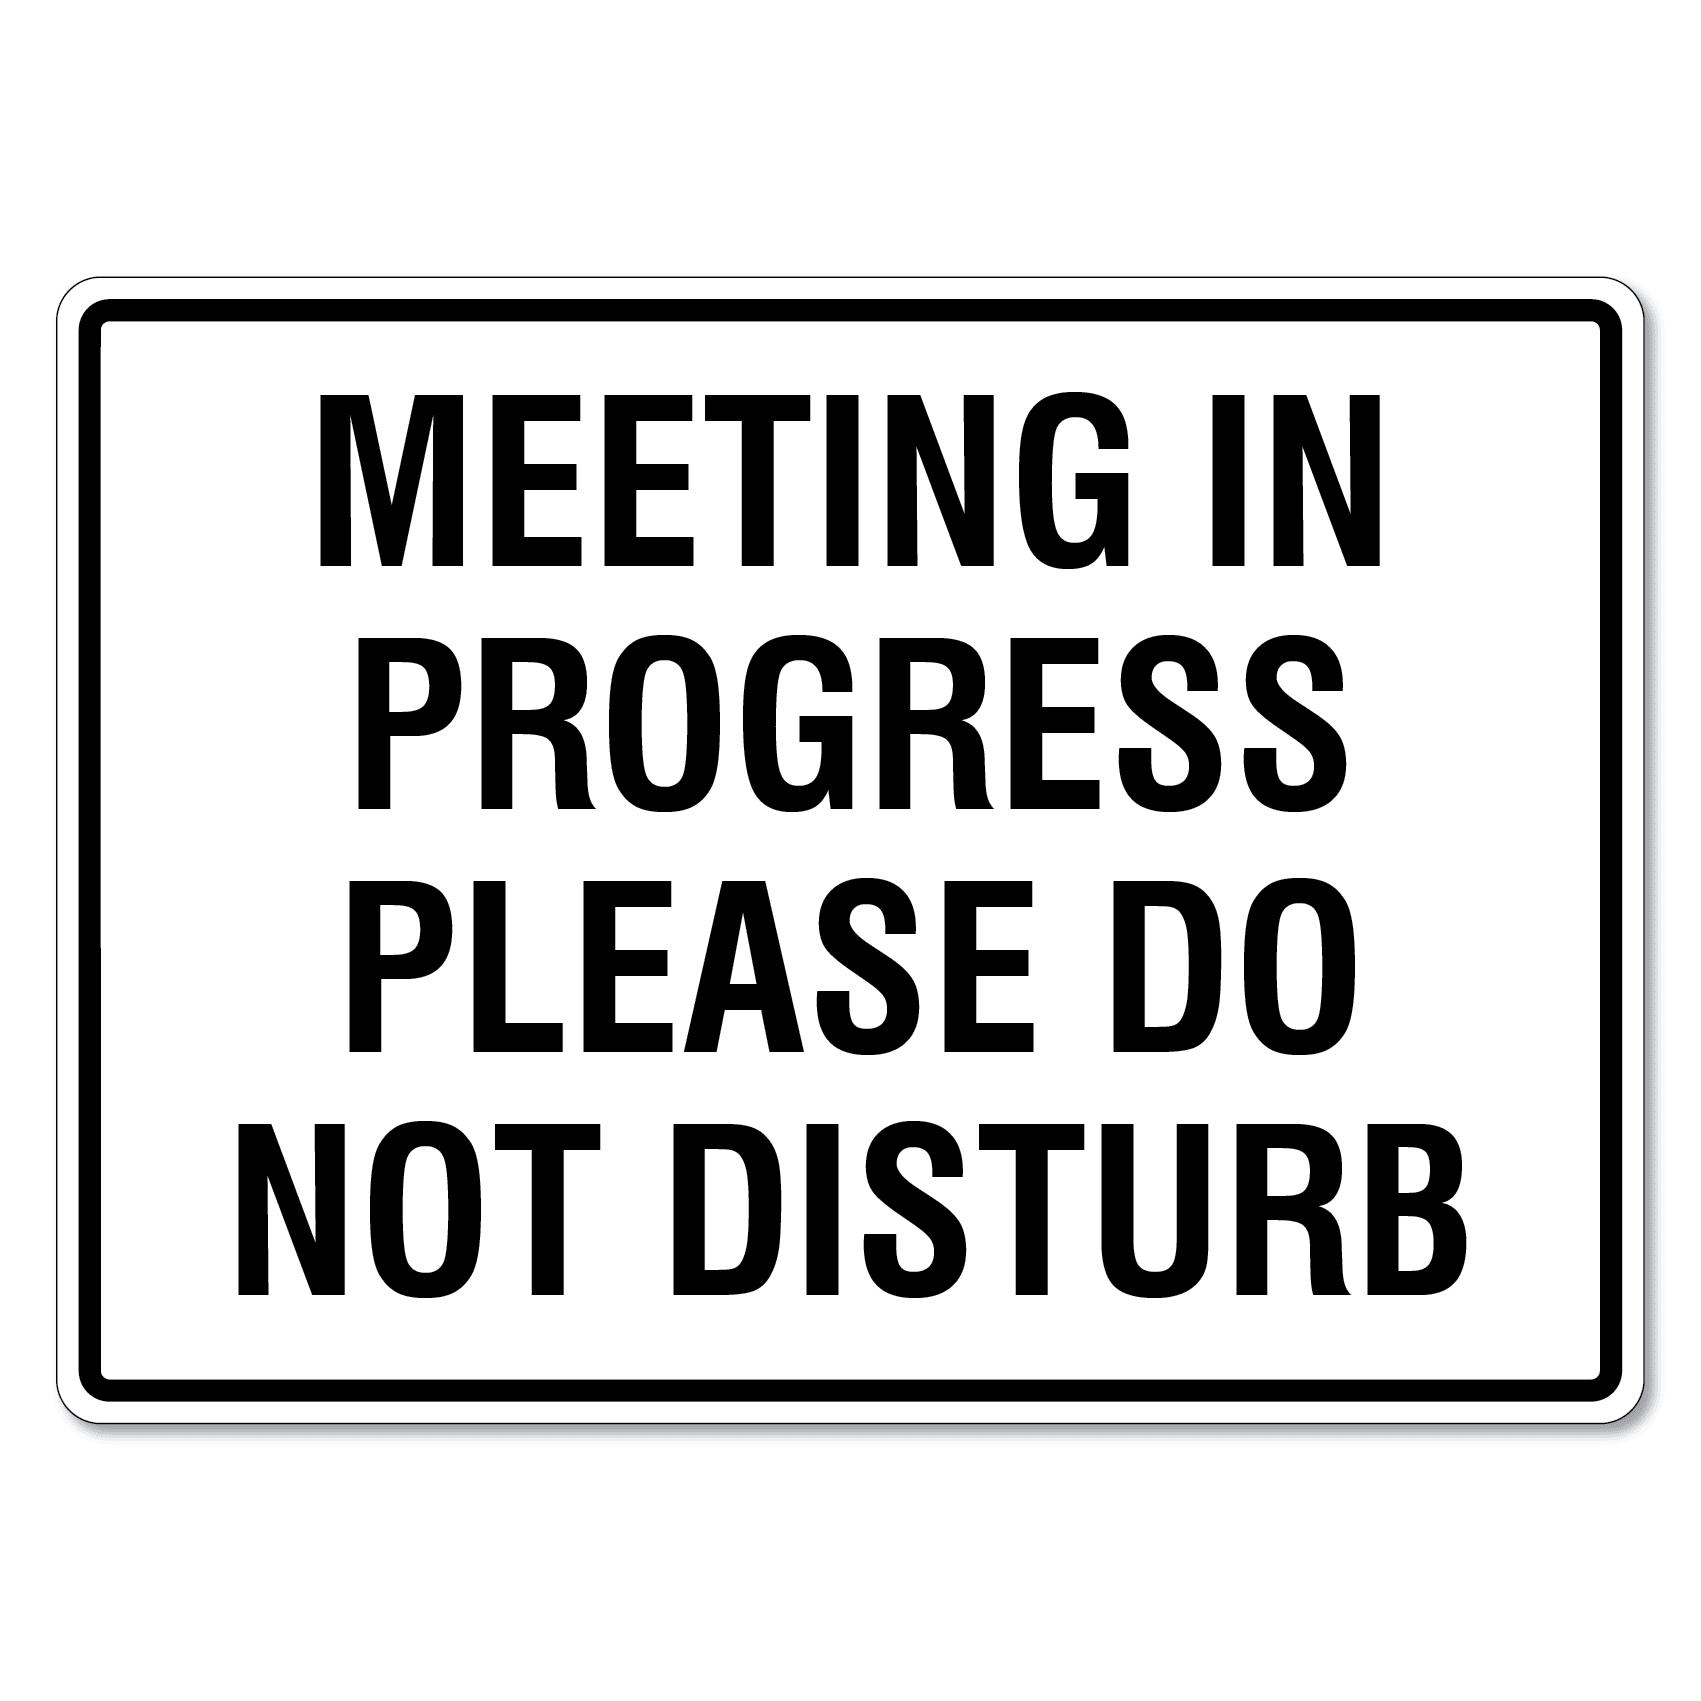 meeting in progress please do not disturb sign